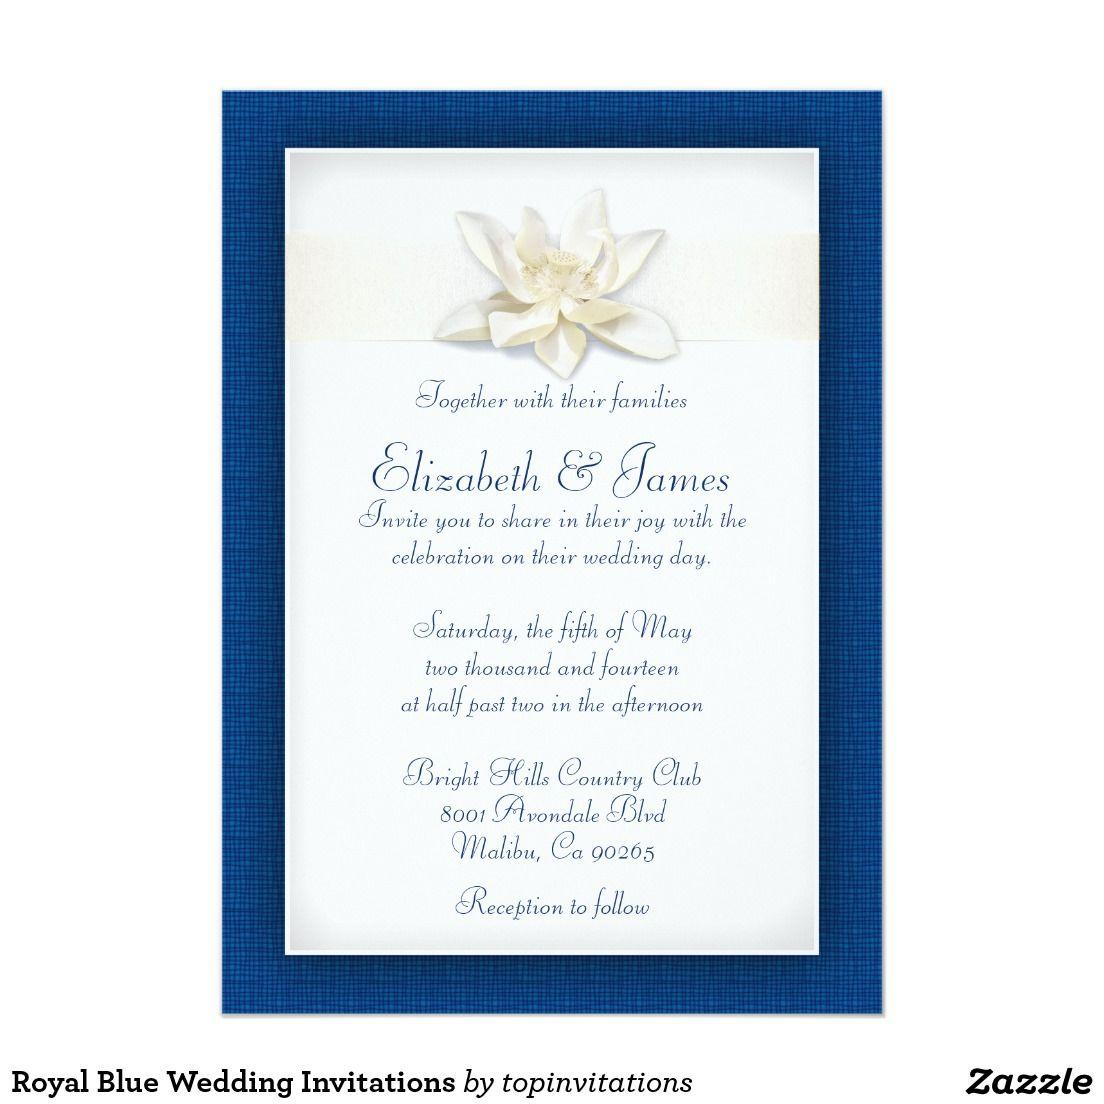 party invitations royal blue wedding invitations royal blue wedding invitations